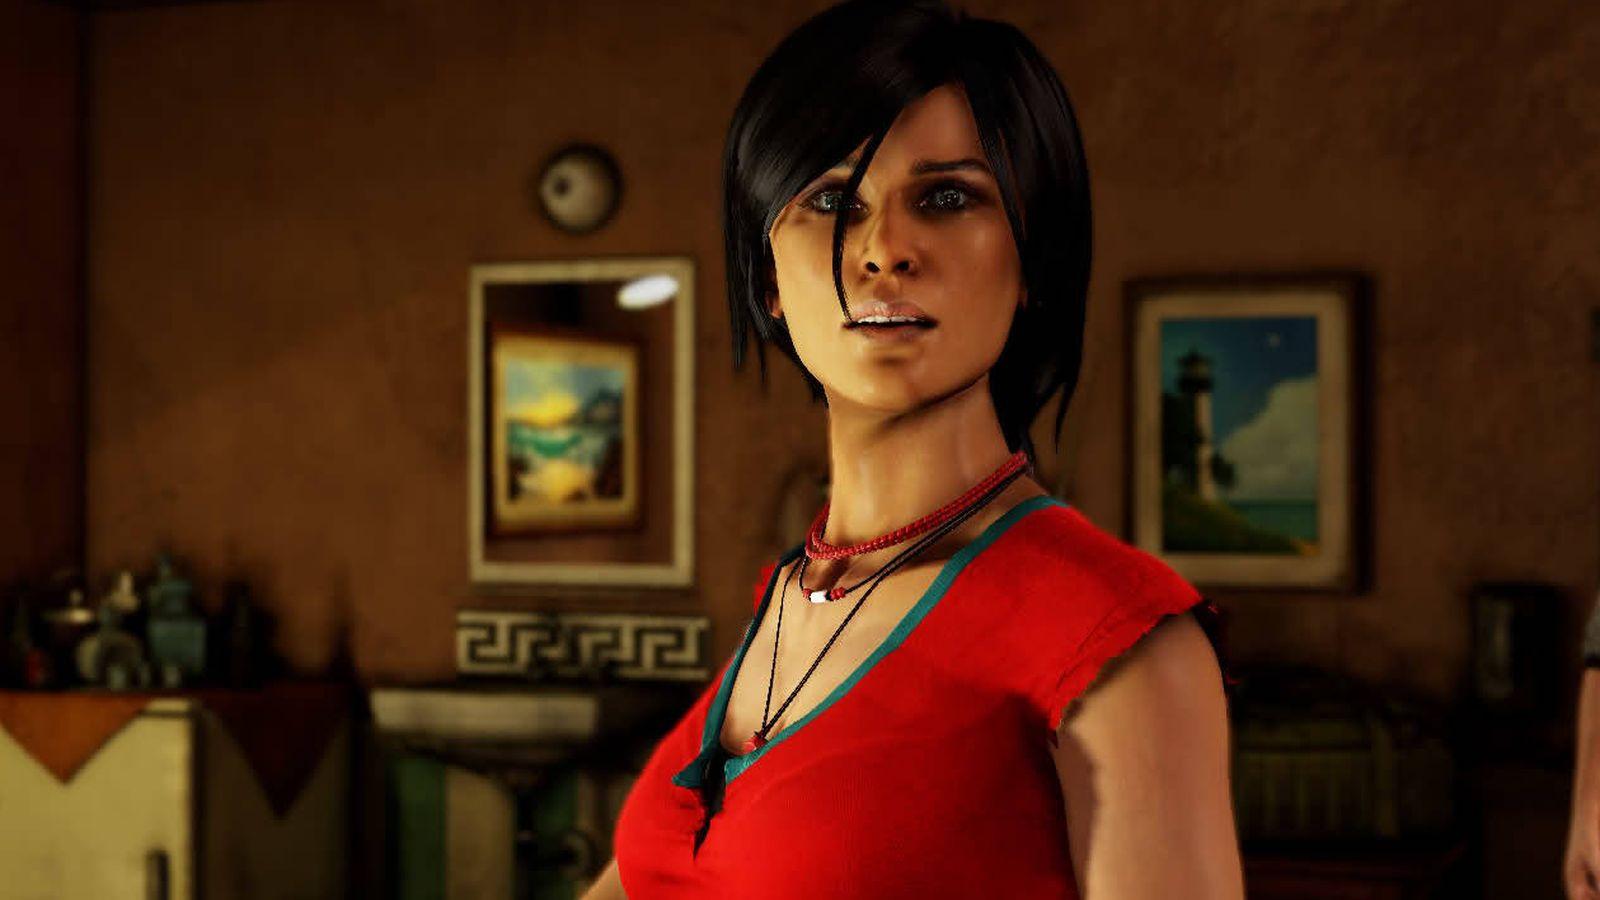 Foto: Imagen del juego 'Uncharted: The Lost Legacy'